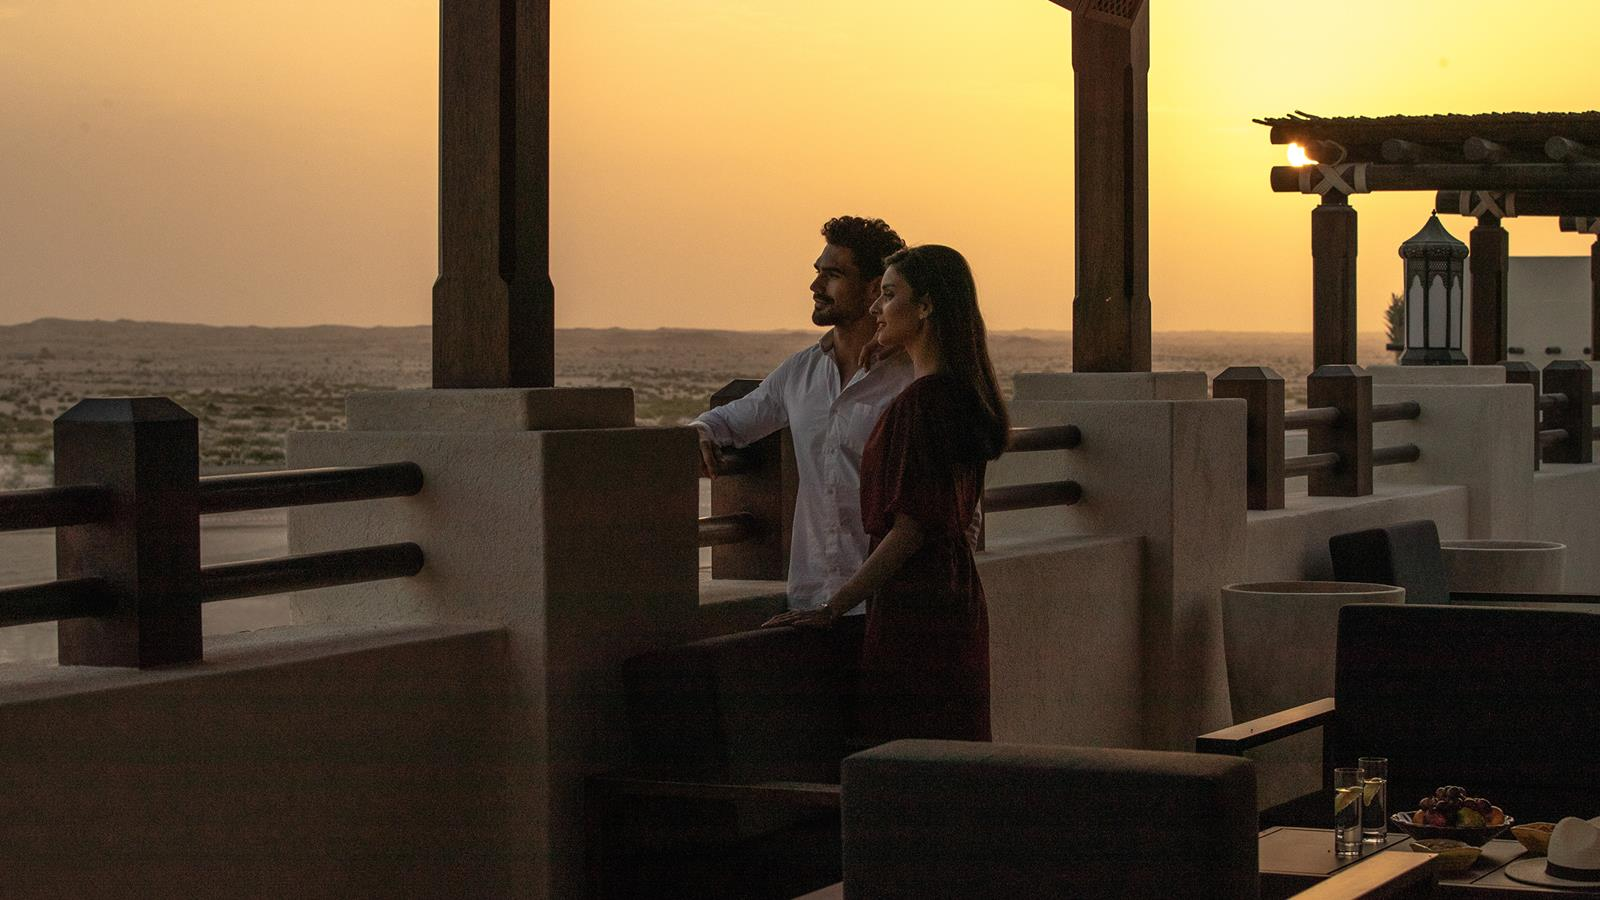 jumeirah-al-wathba-lifestyle-sunset